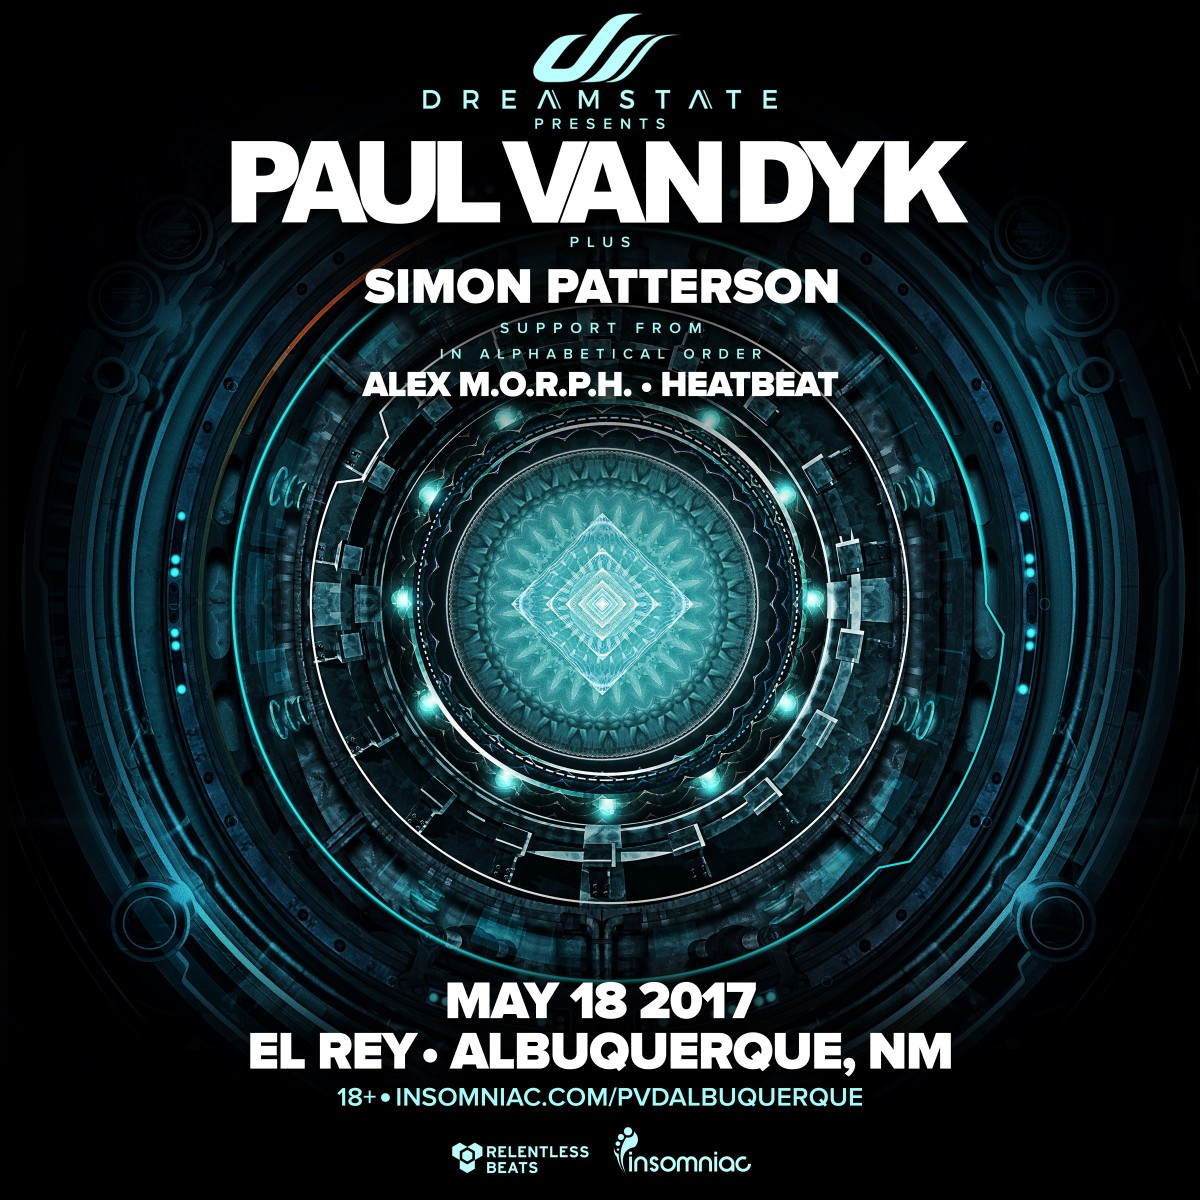 Flyer for Dreamstate presents: Paul van Dyk in Albuquerque